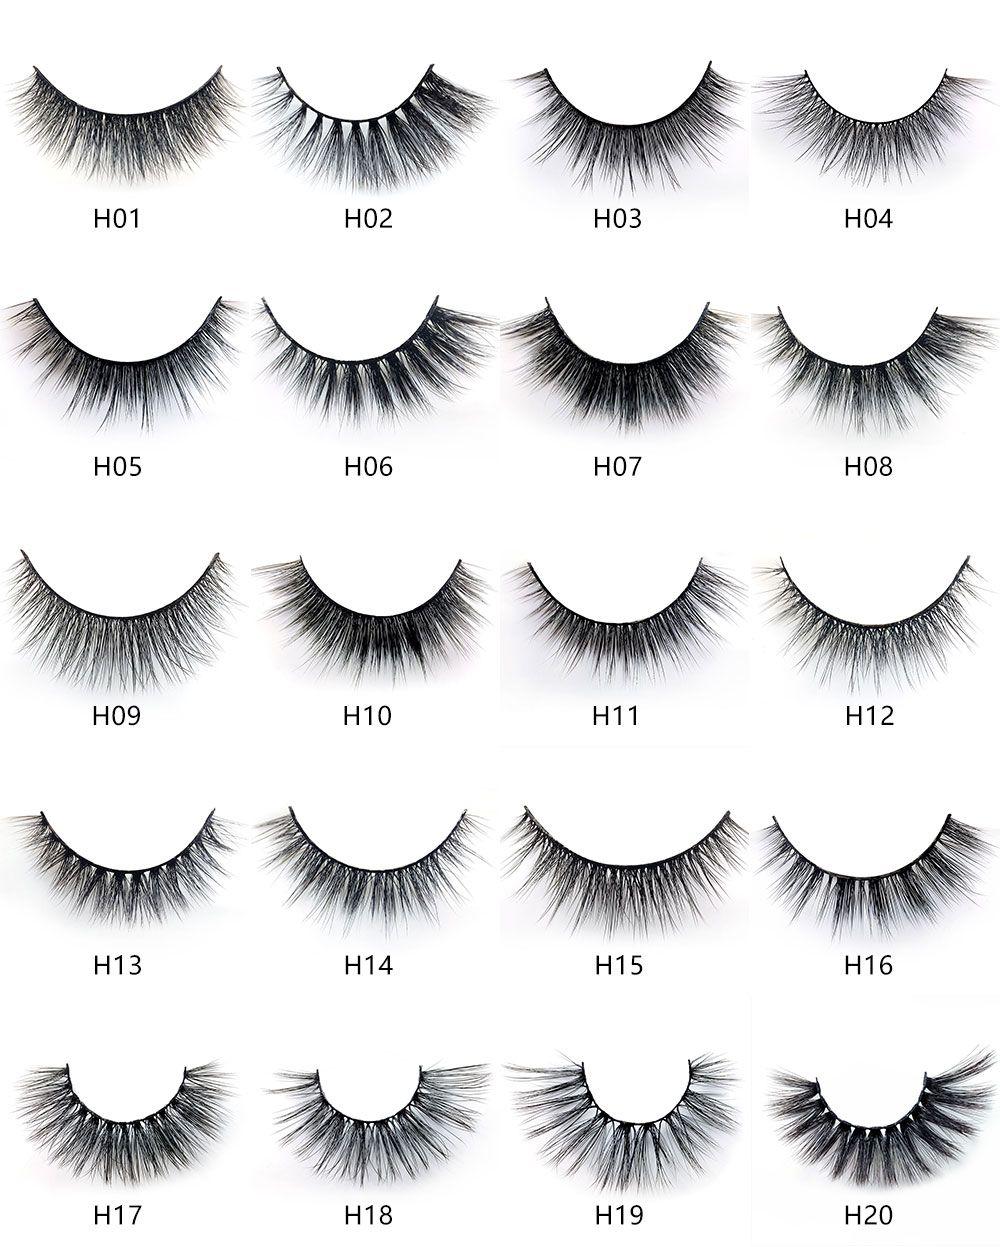 Serie H 20 estilo 5 pares / set visón 3D False EyeLashes 5 pares 3D pestañas falsas largas naturales